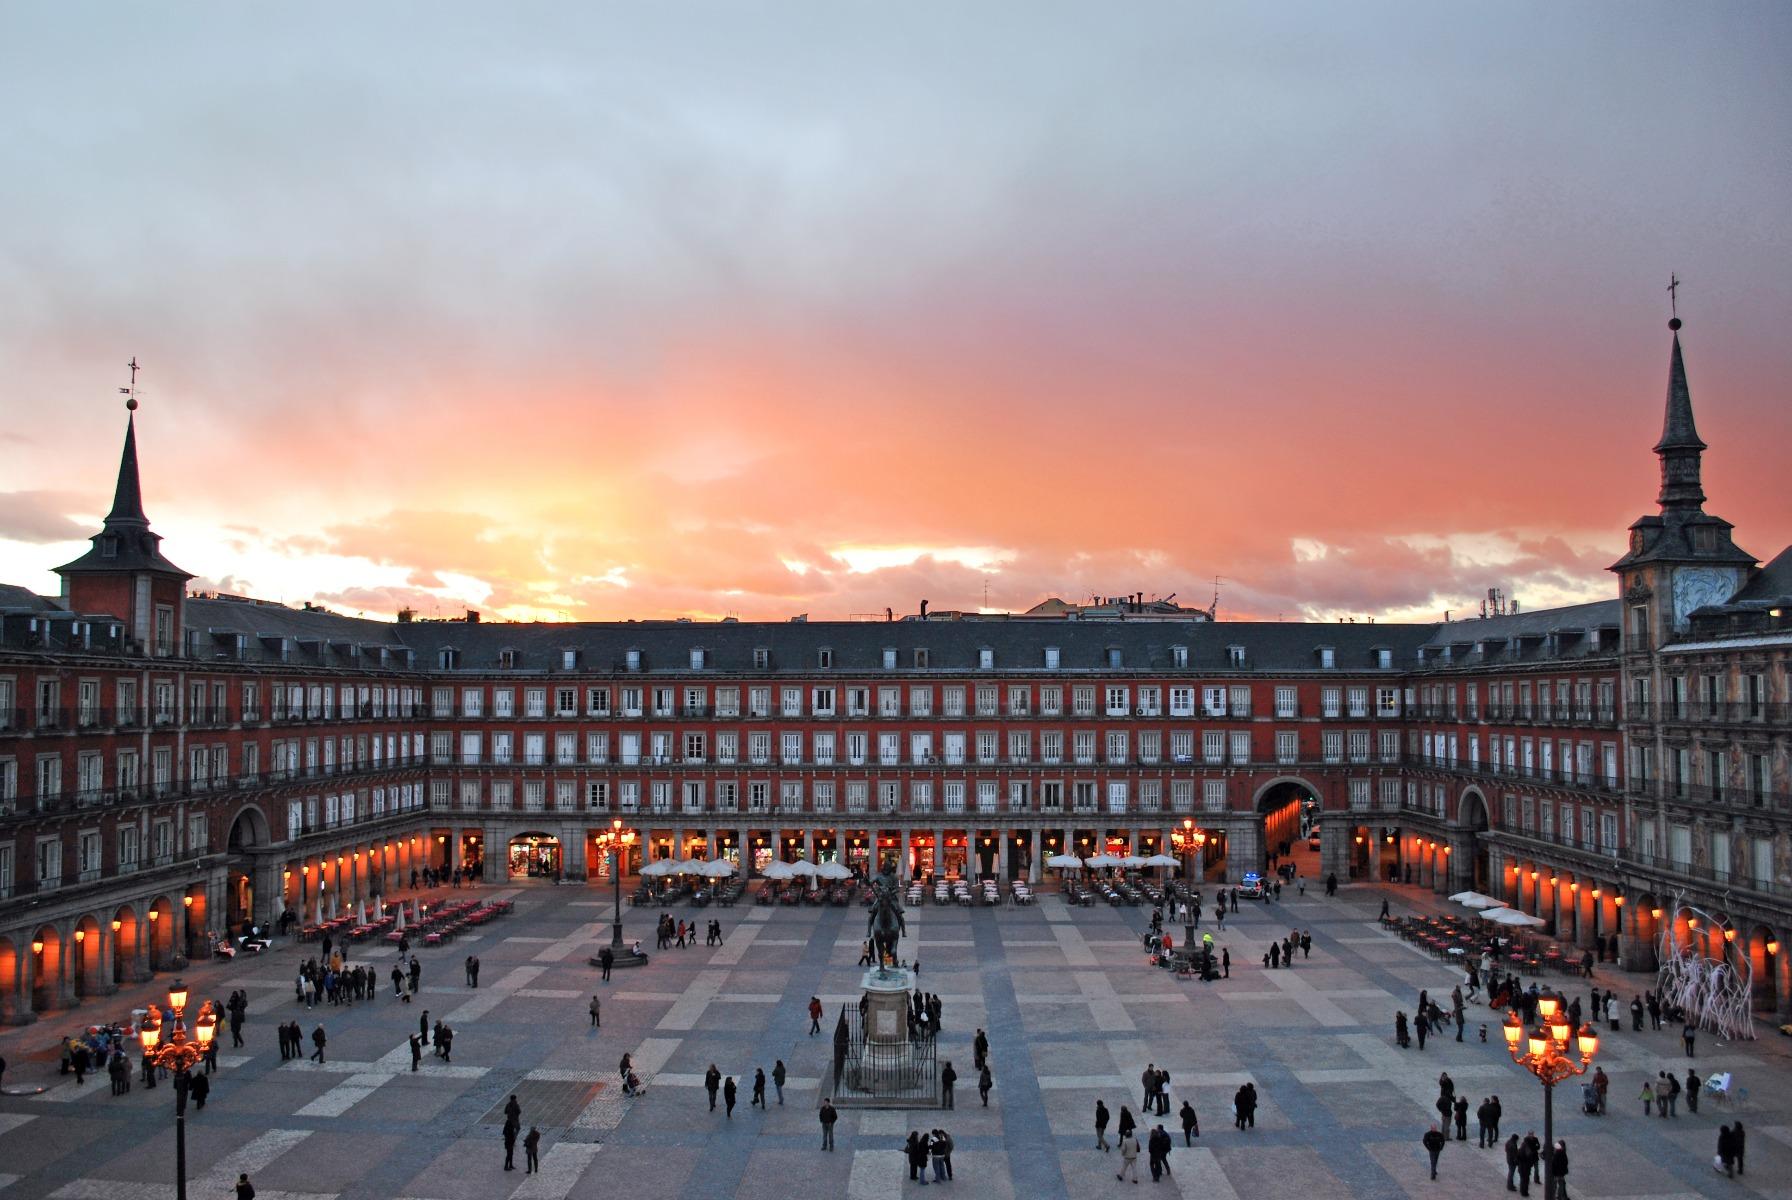 Plaza Mayor: